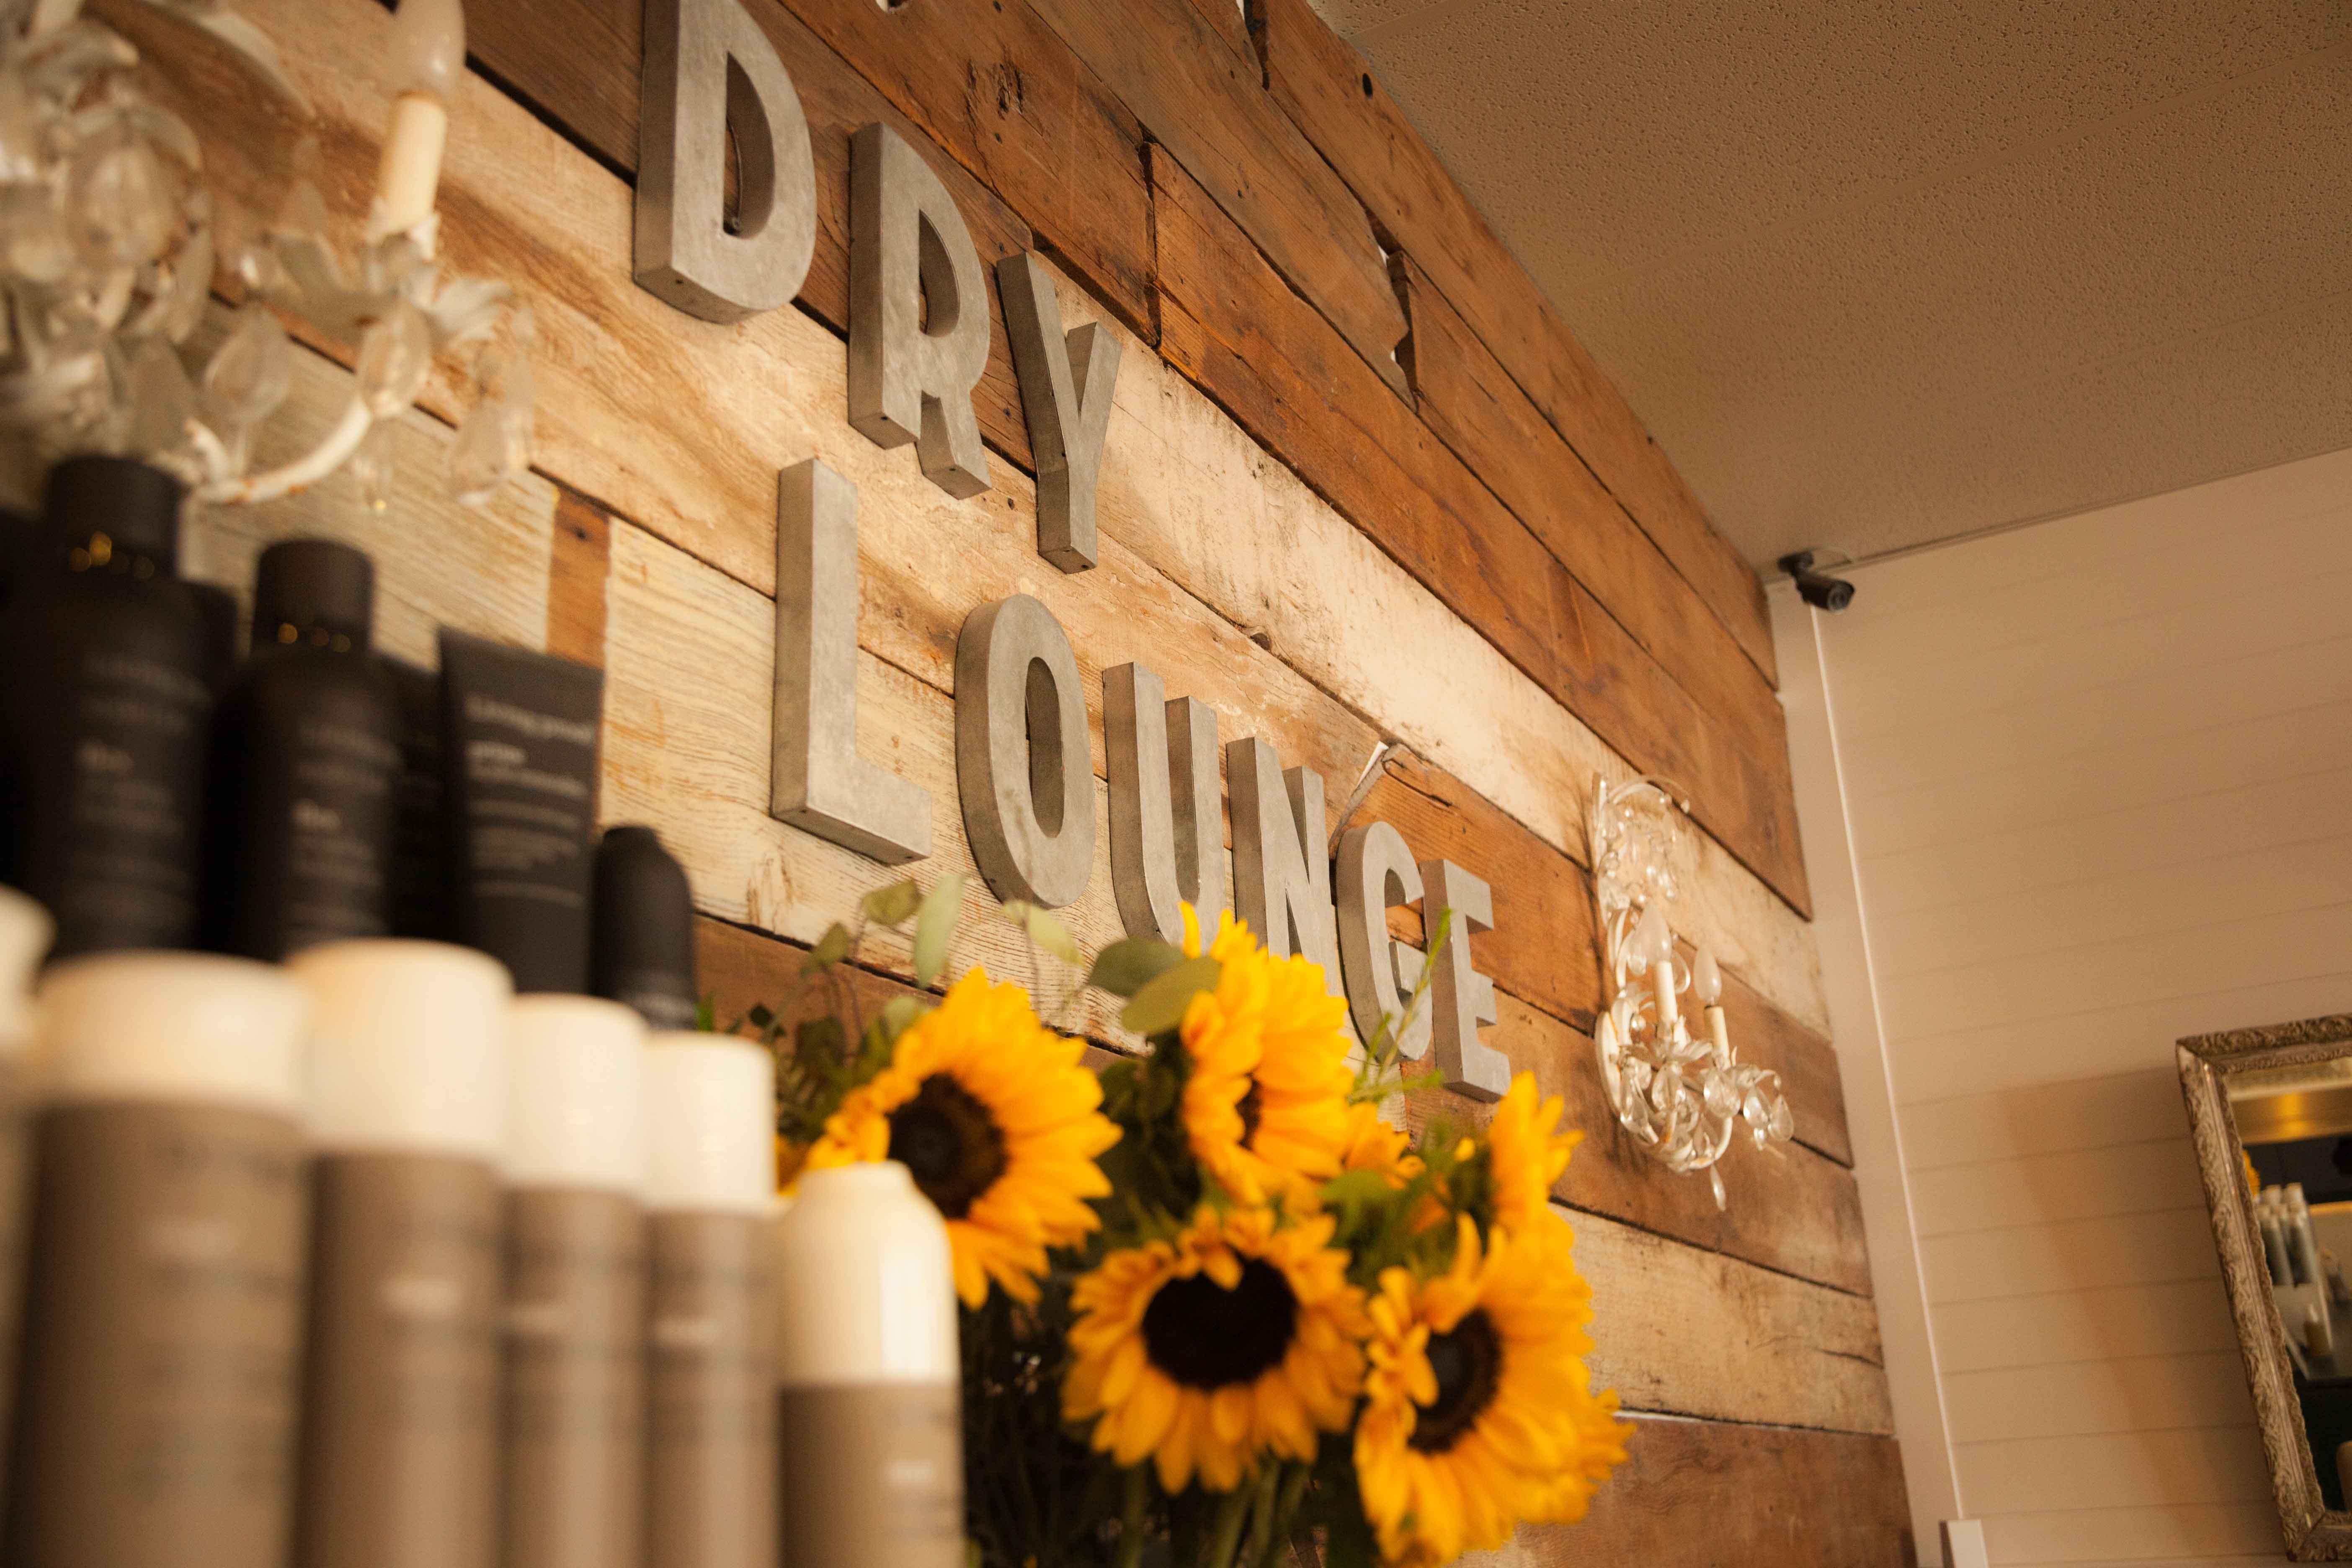 Dry Lounge